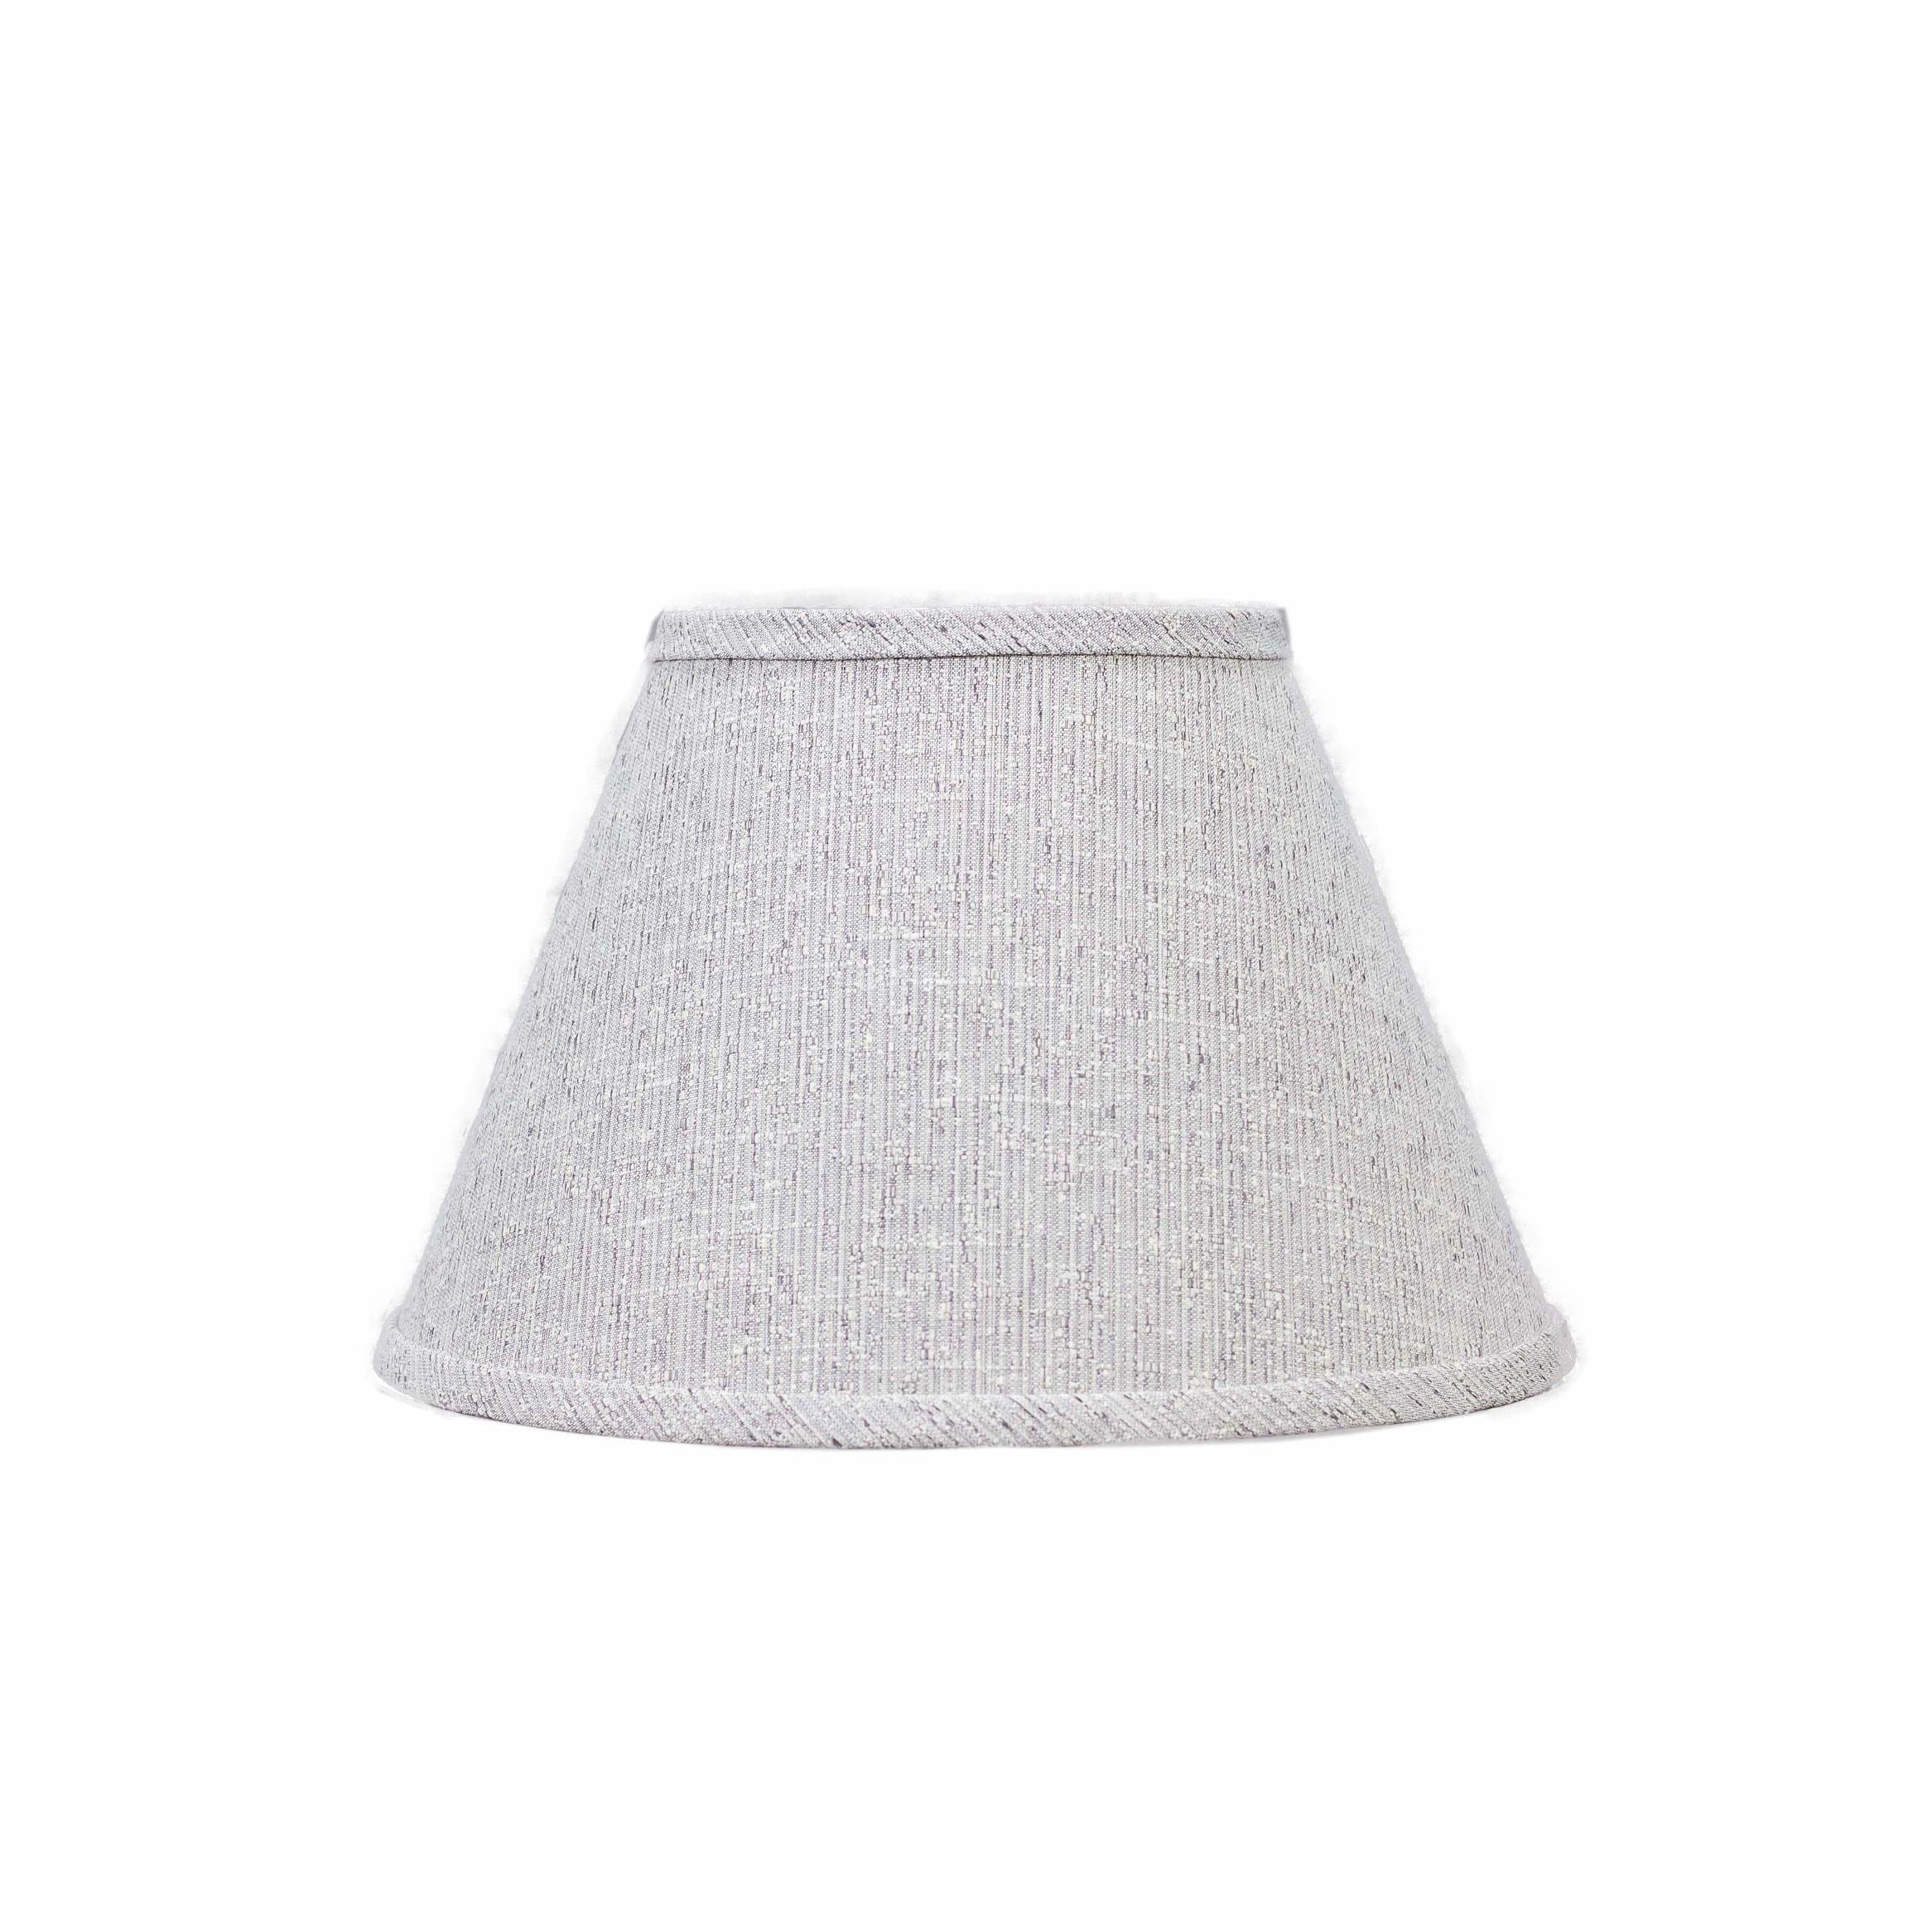 config uno shades fitter com basic lampshade lamp wk bell true shade royallampshades